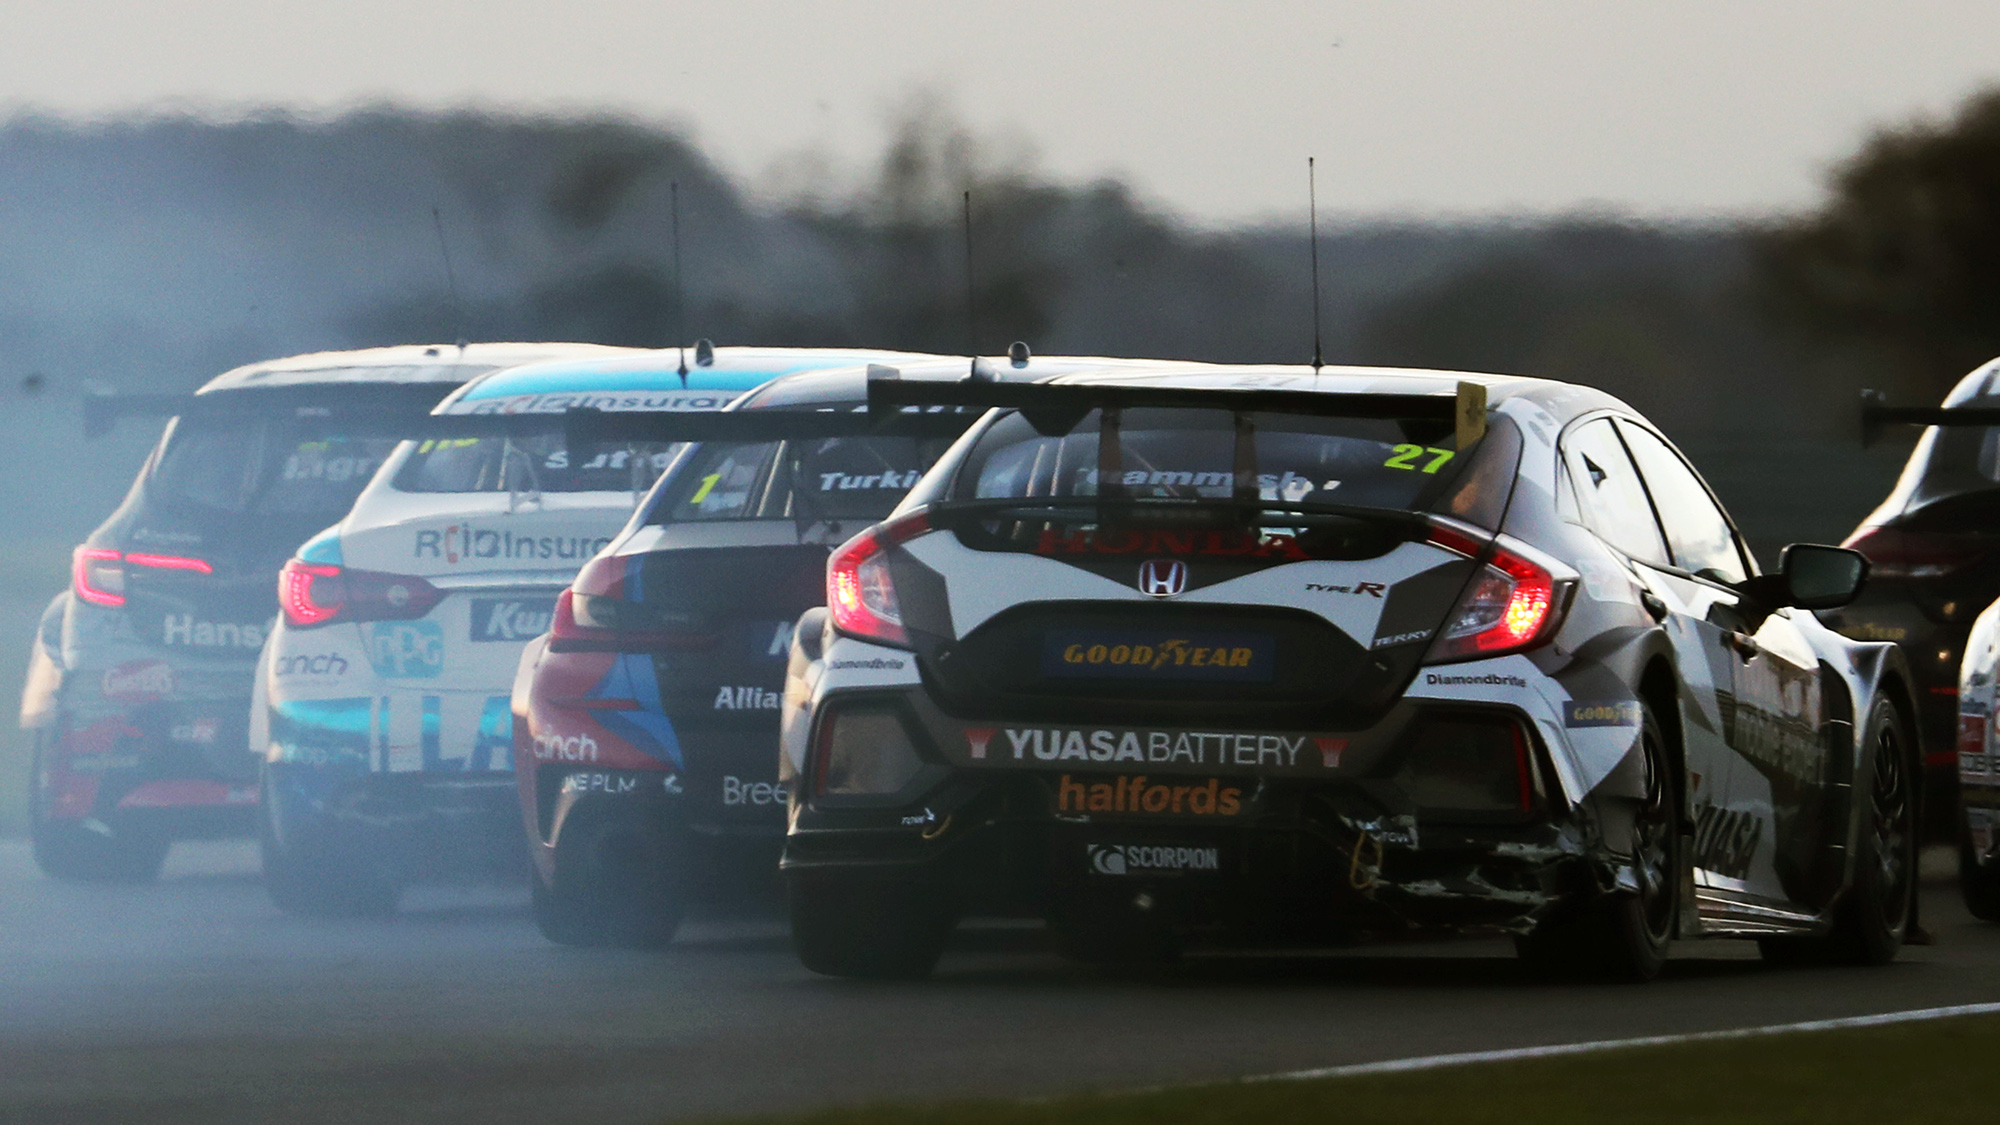 Four cars battle at Snetterton in the 2020 BTCC round